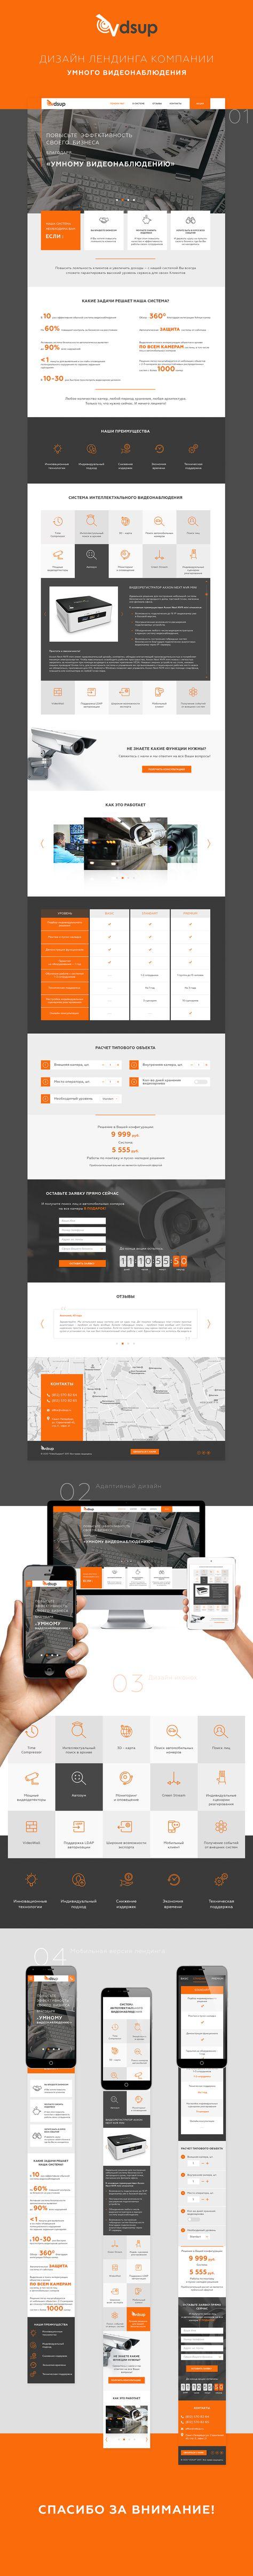 Design of Landing Page for Vdsup